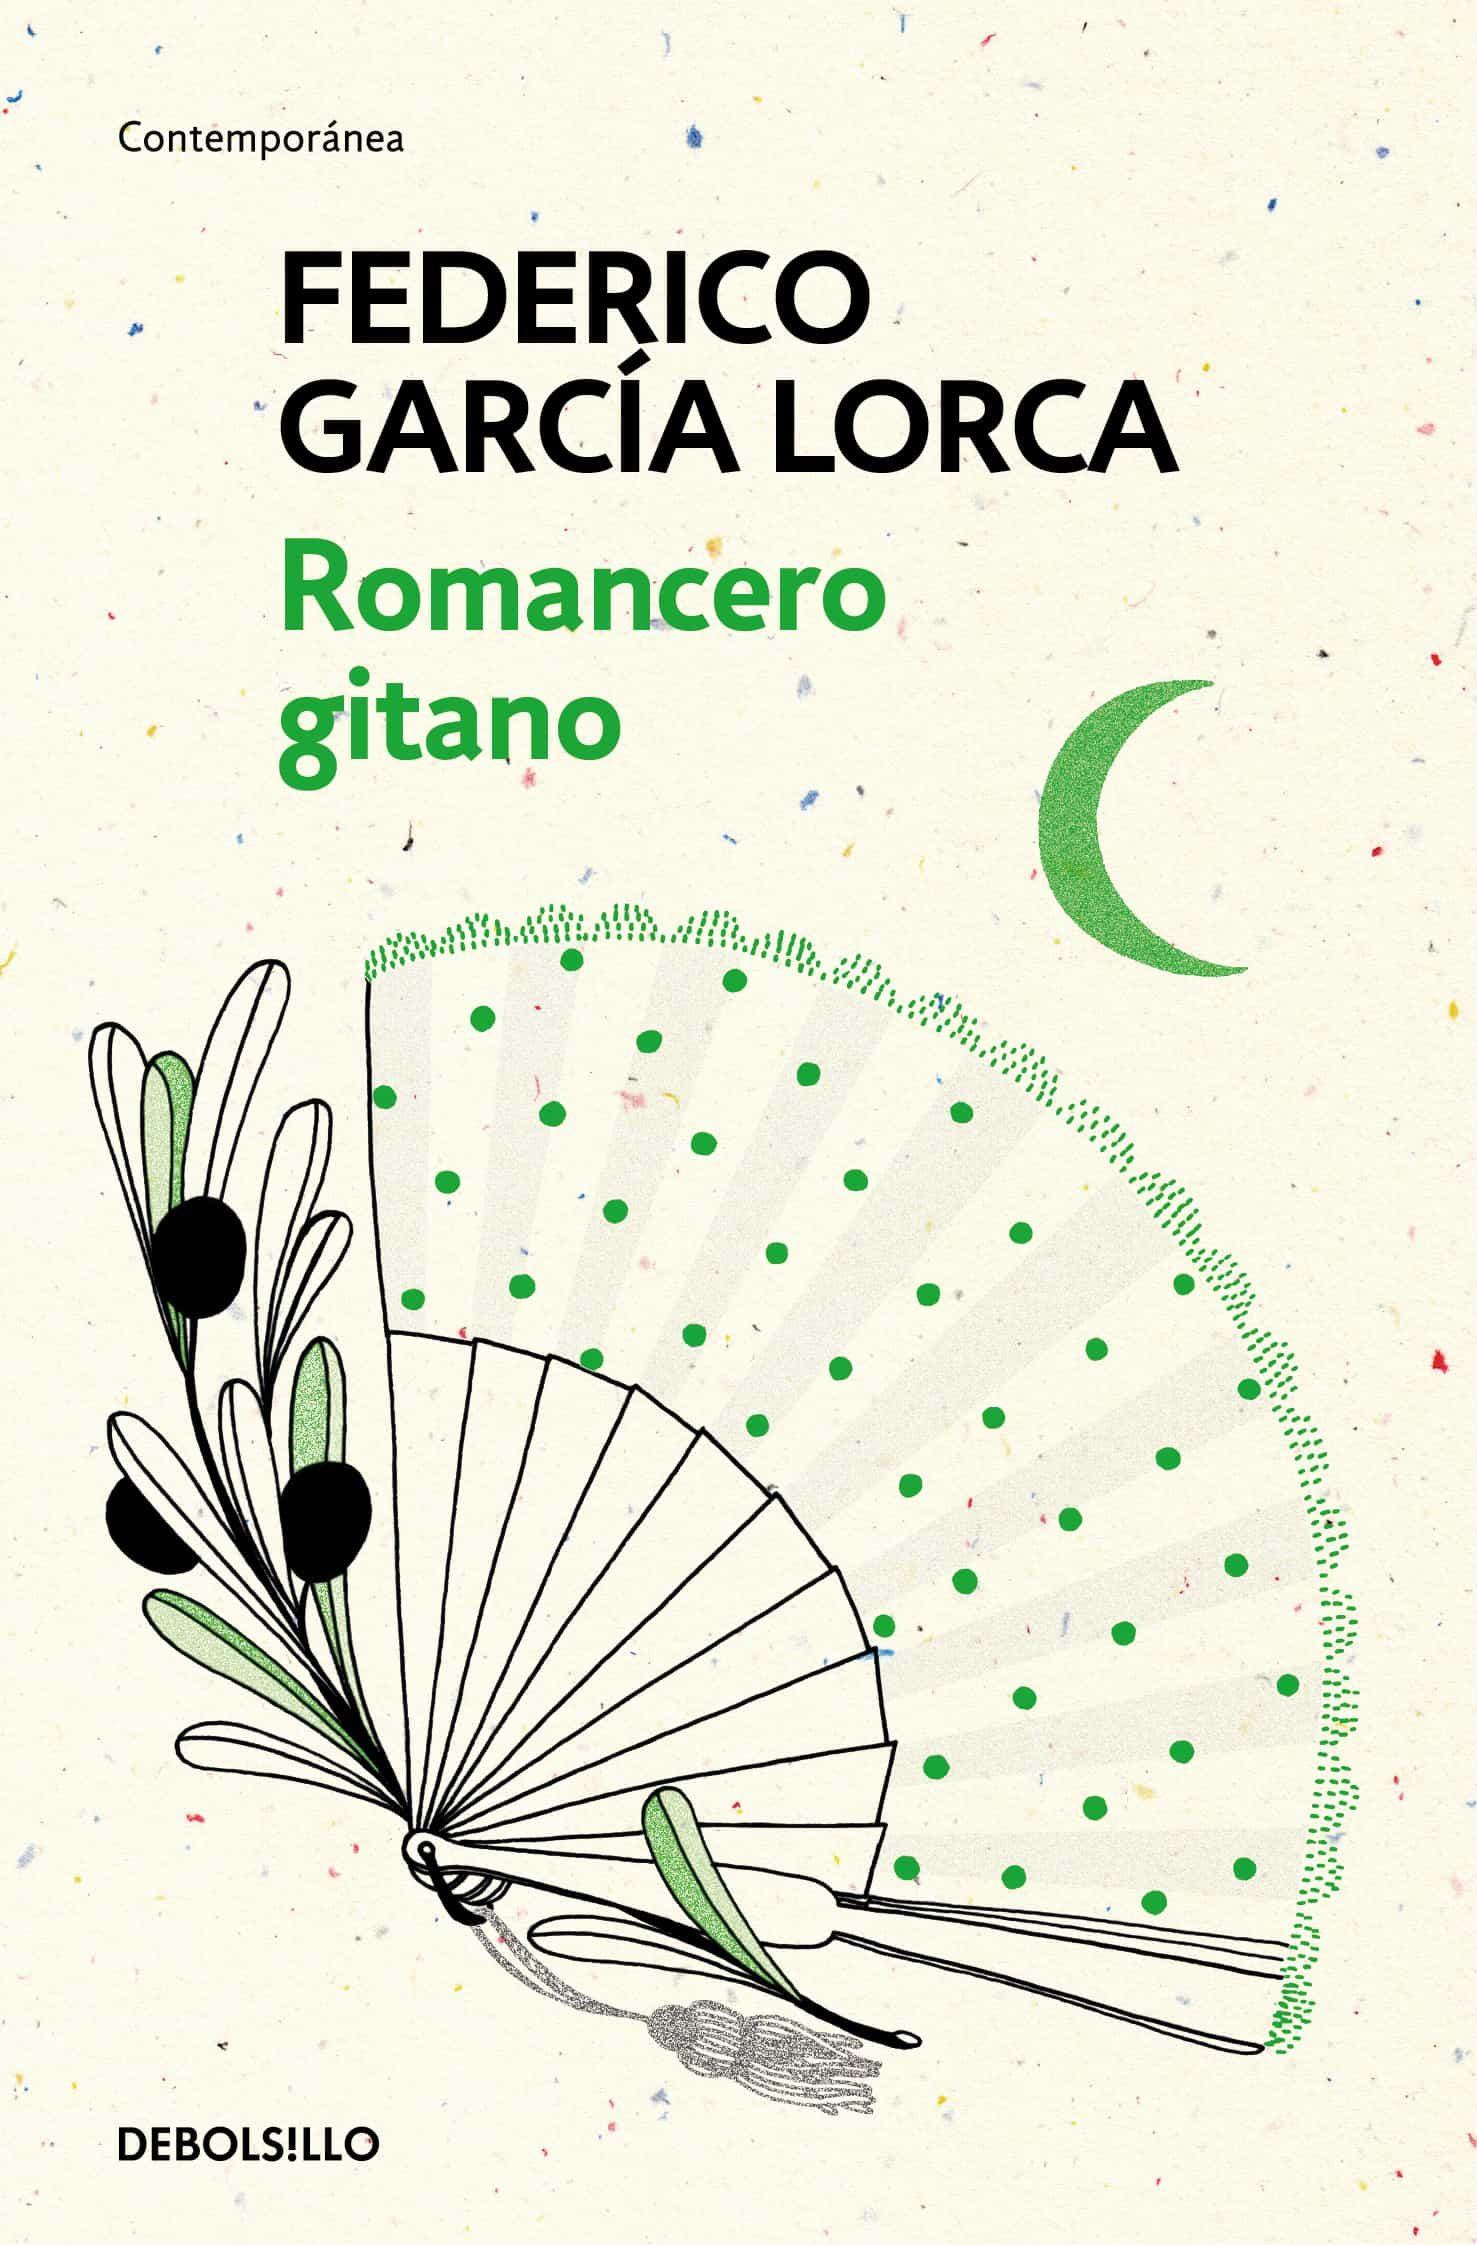 Romancero gitano ebook federico garcia lorca 9788466337908